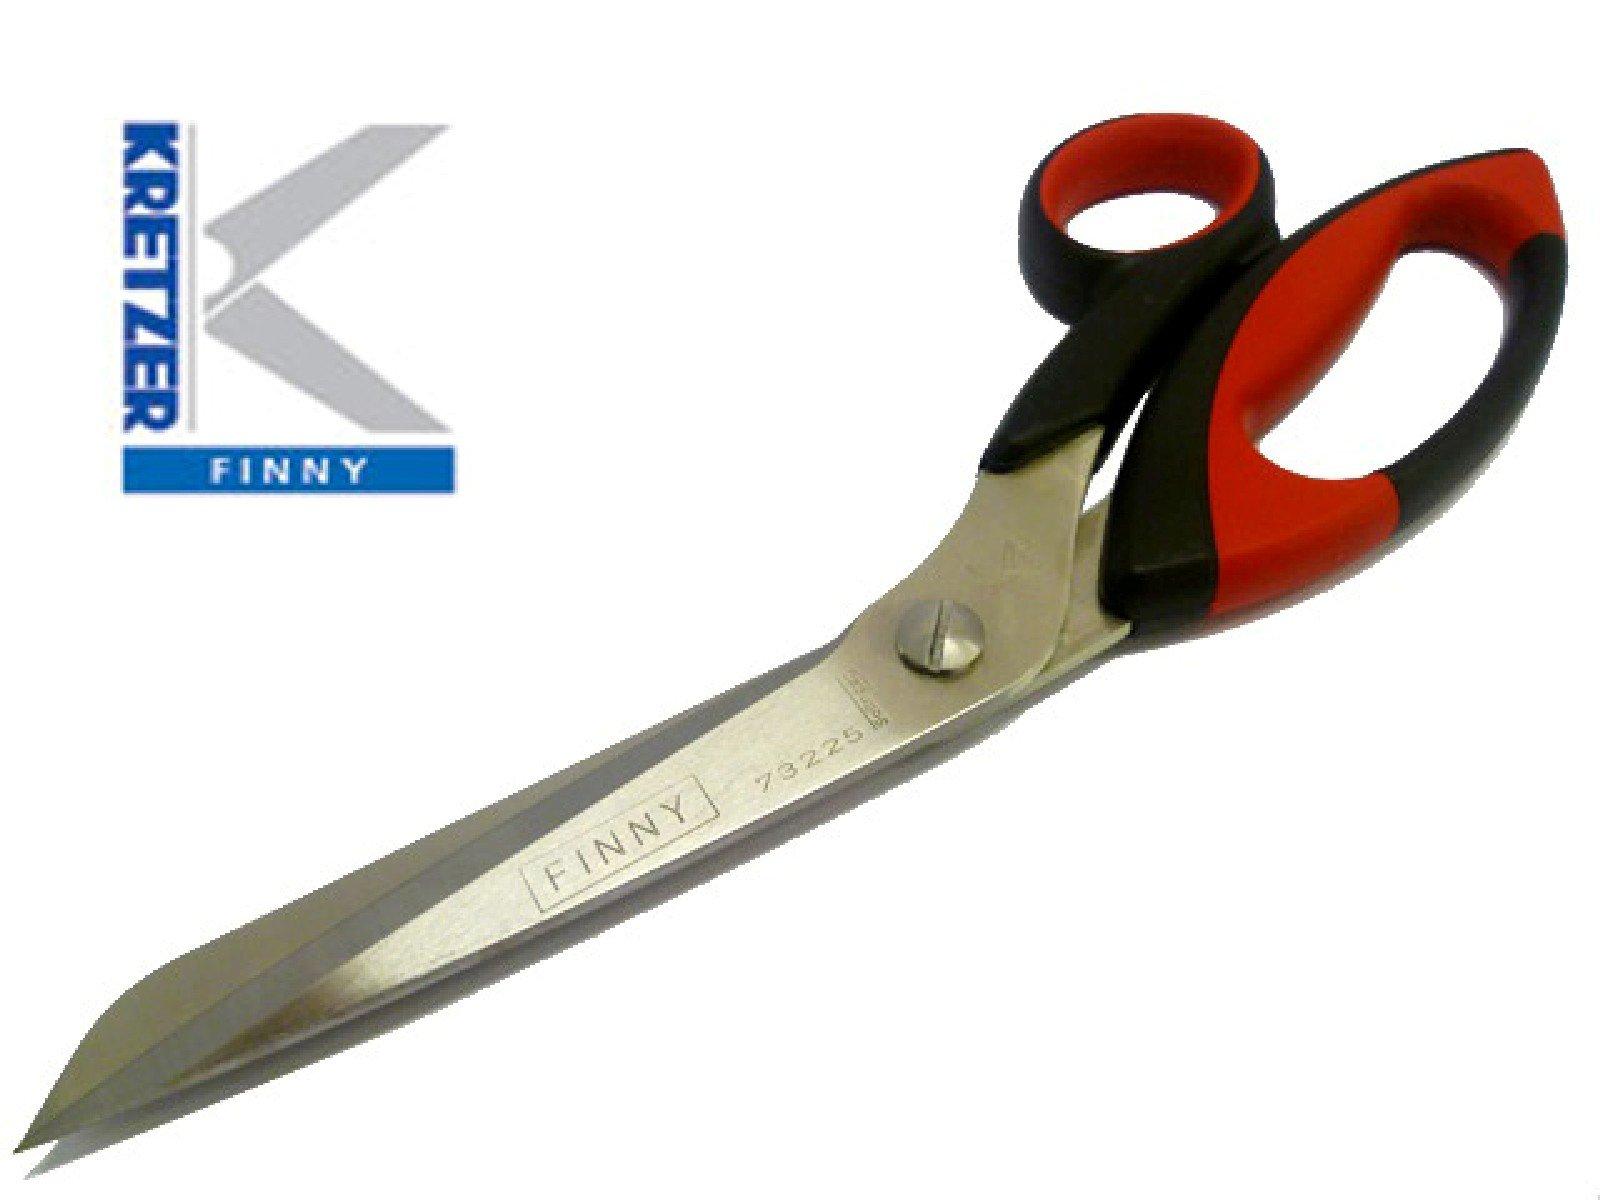 Kretzer Finny 773225 (73225) 10.0'' / 25cm - Heavy Duty, Carpet/Cardboard / Drapery/Foil / Tailor's/Upholstery Scissors ~ Shears